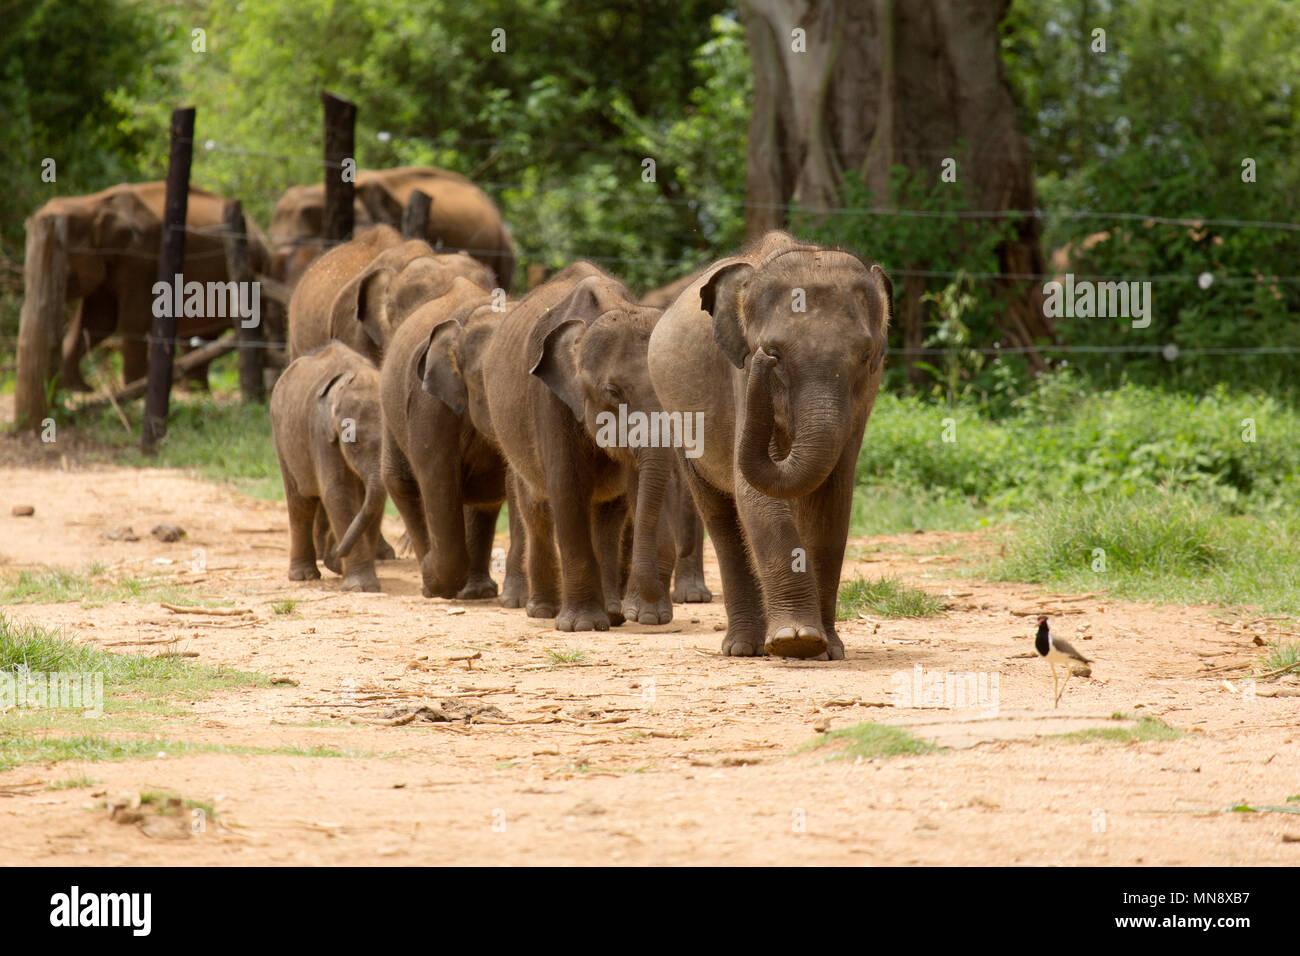 Sri Lanka Elephant High Resolution Stock Photography And Images Alamy Sri lankan elephant | the life of animals. https www alamy com elephants feeding at the udwawalawe elephant transit home at uwawalawe national park in sri lanka image185207771 html